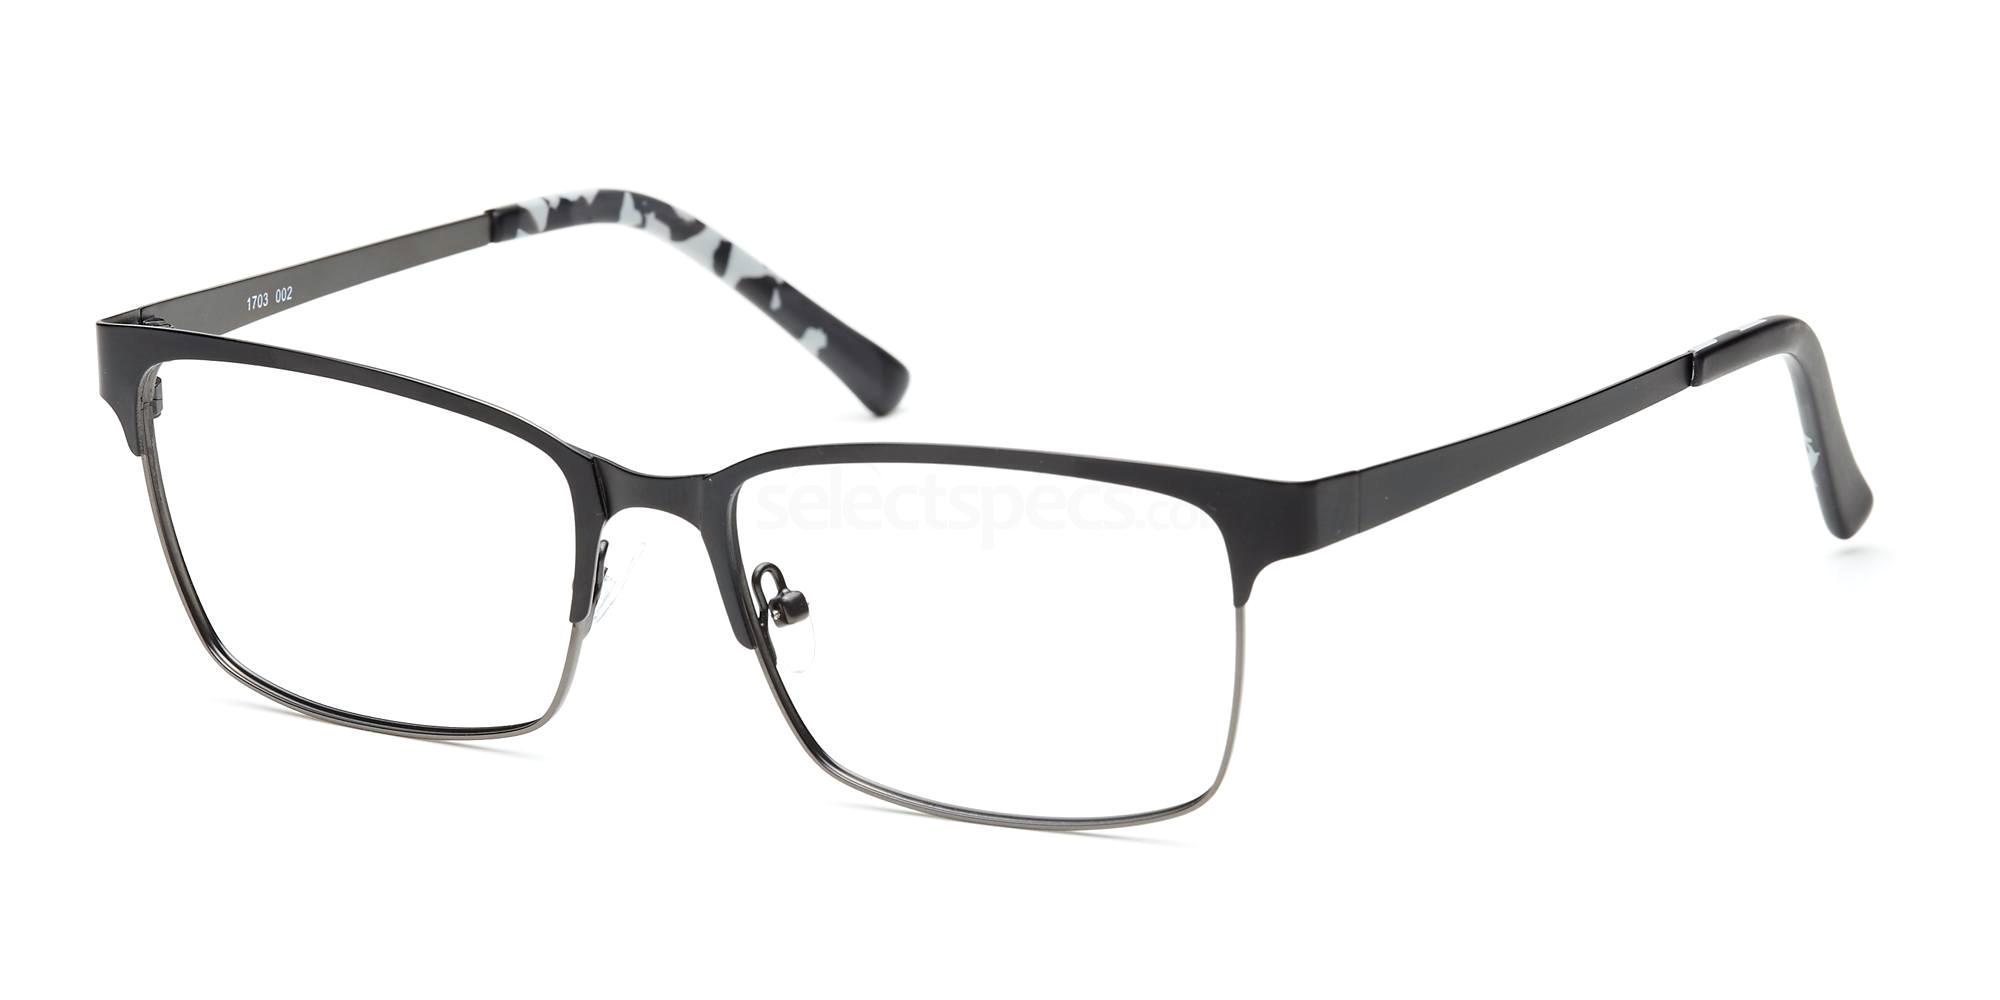 C1 FLX1703 Glasses, Flextra